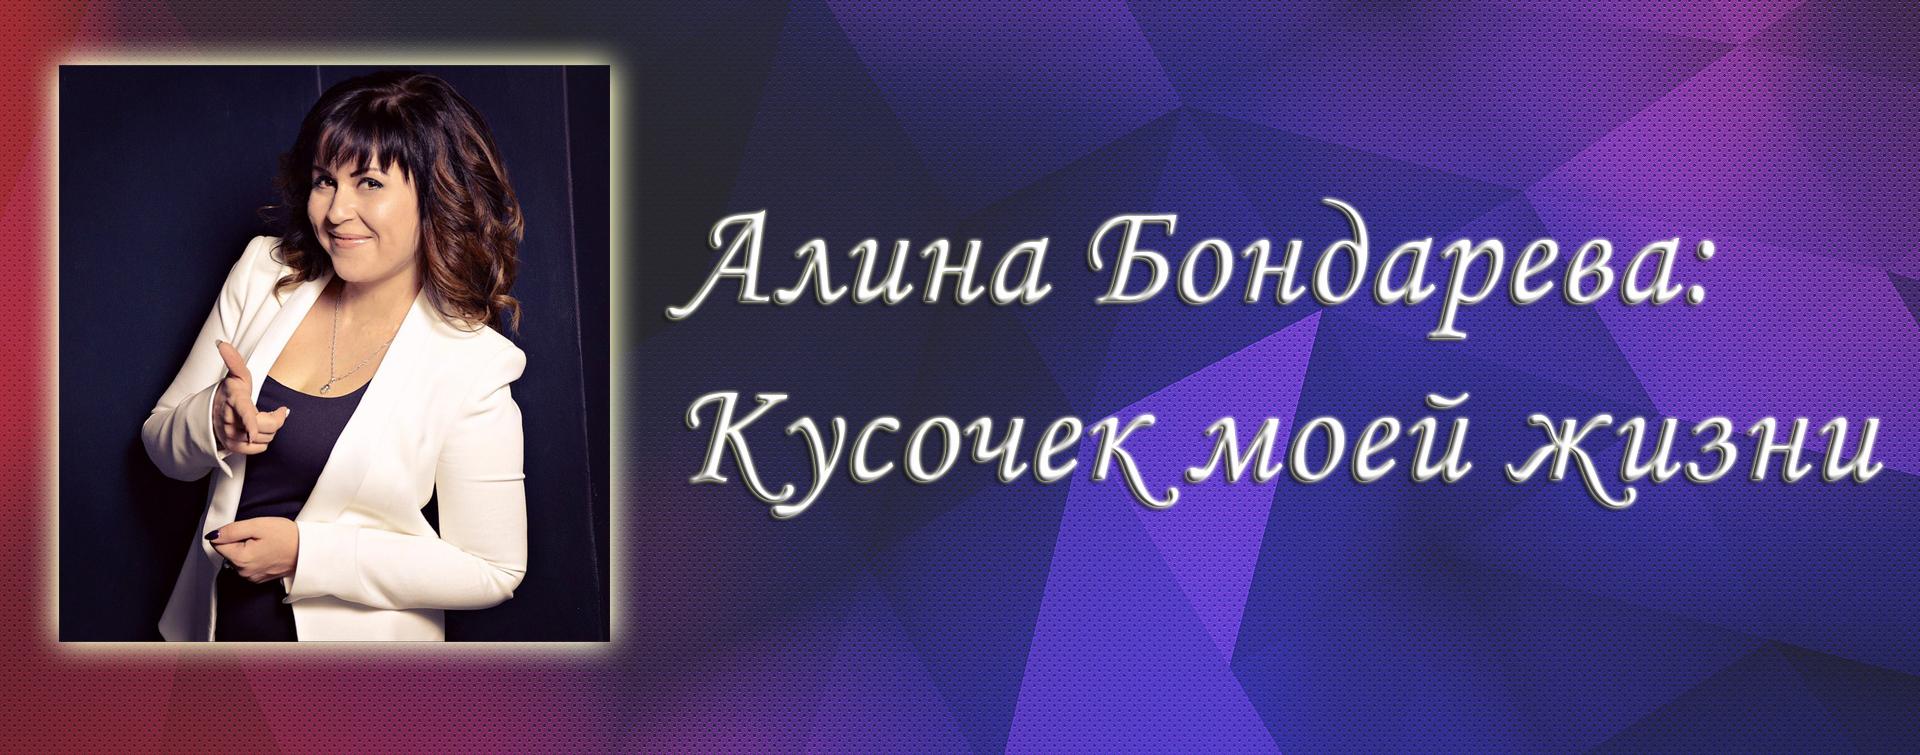 Алина Бондарева copy